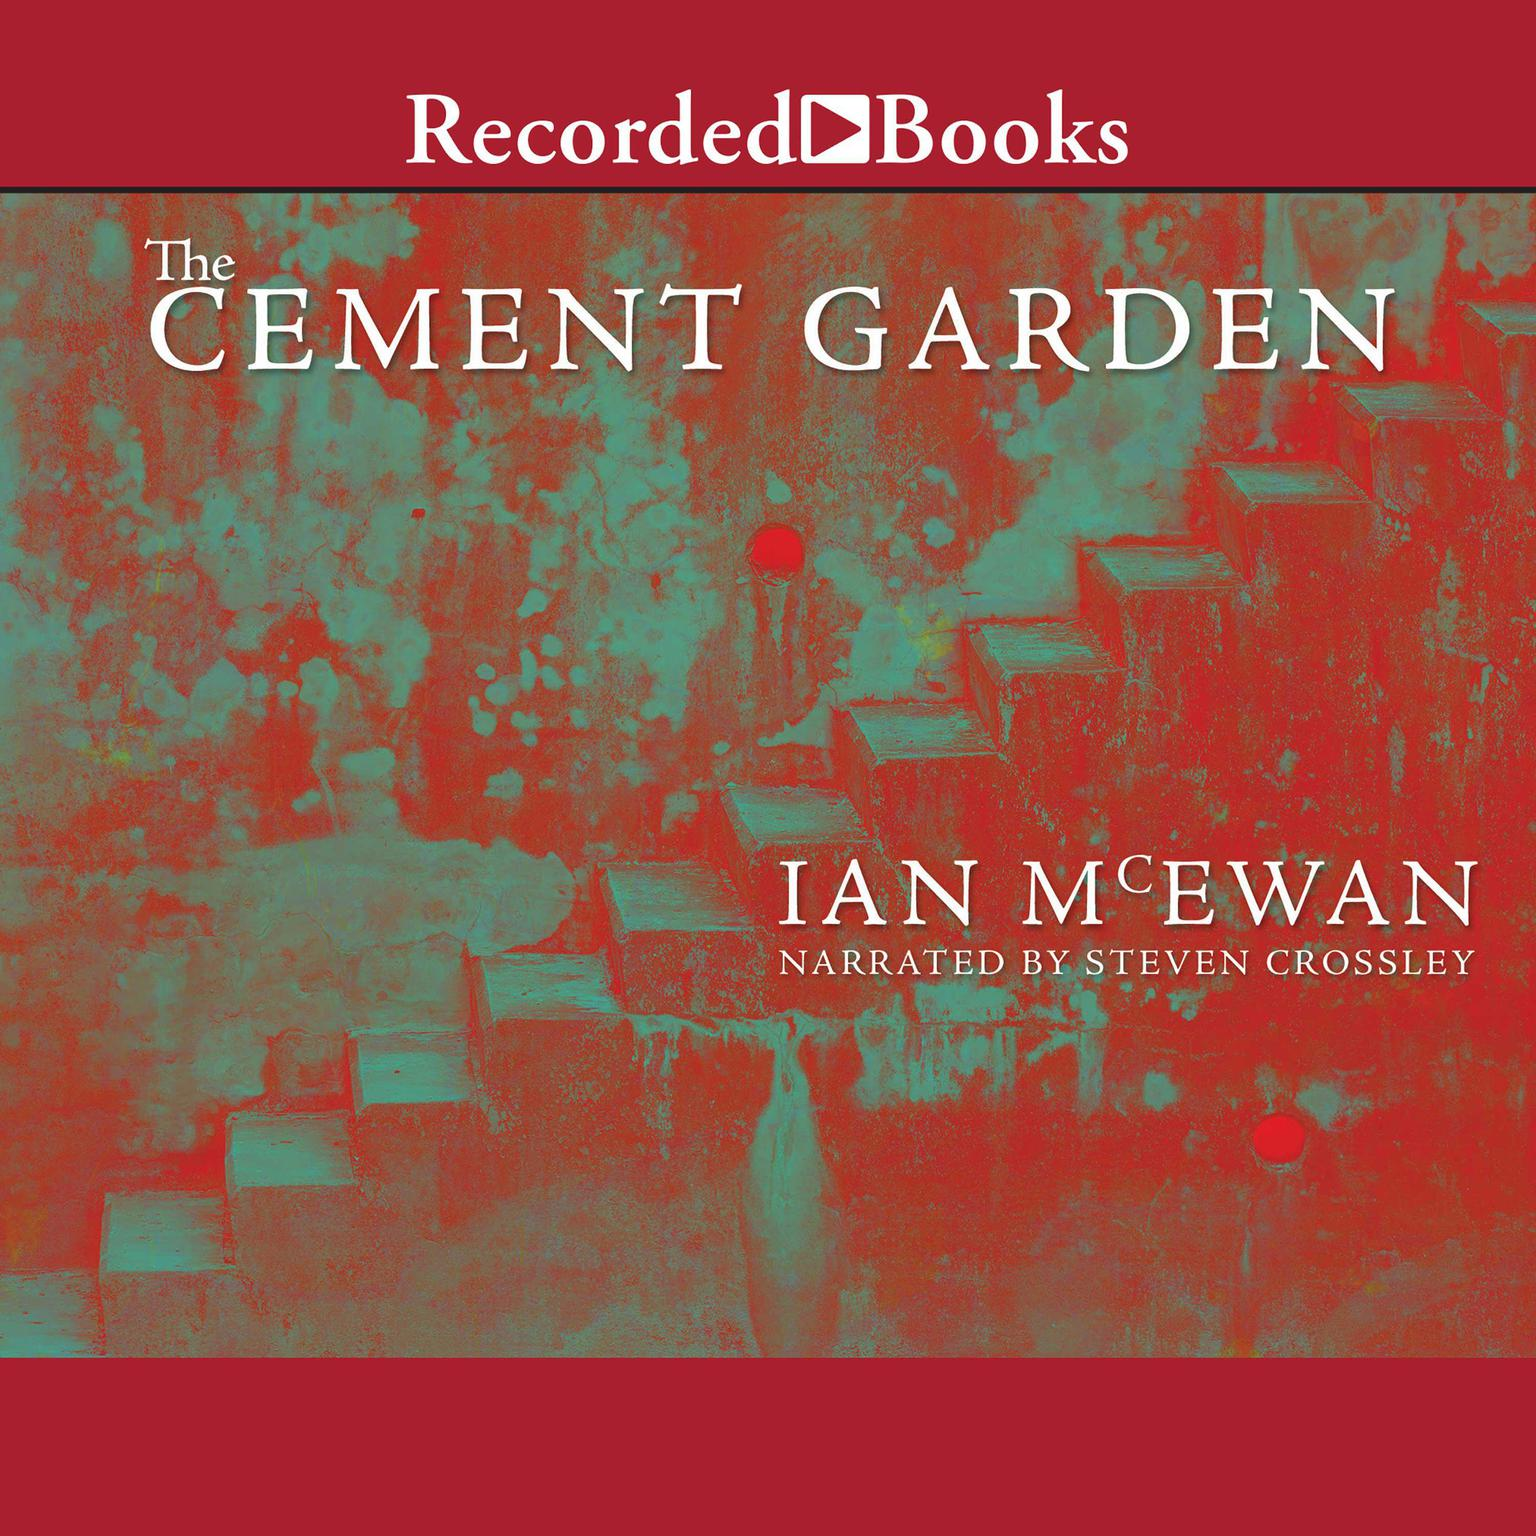 The Cement Garden Audiobook, by Ian McEwan